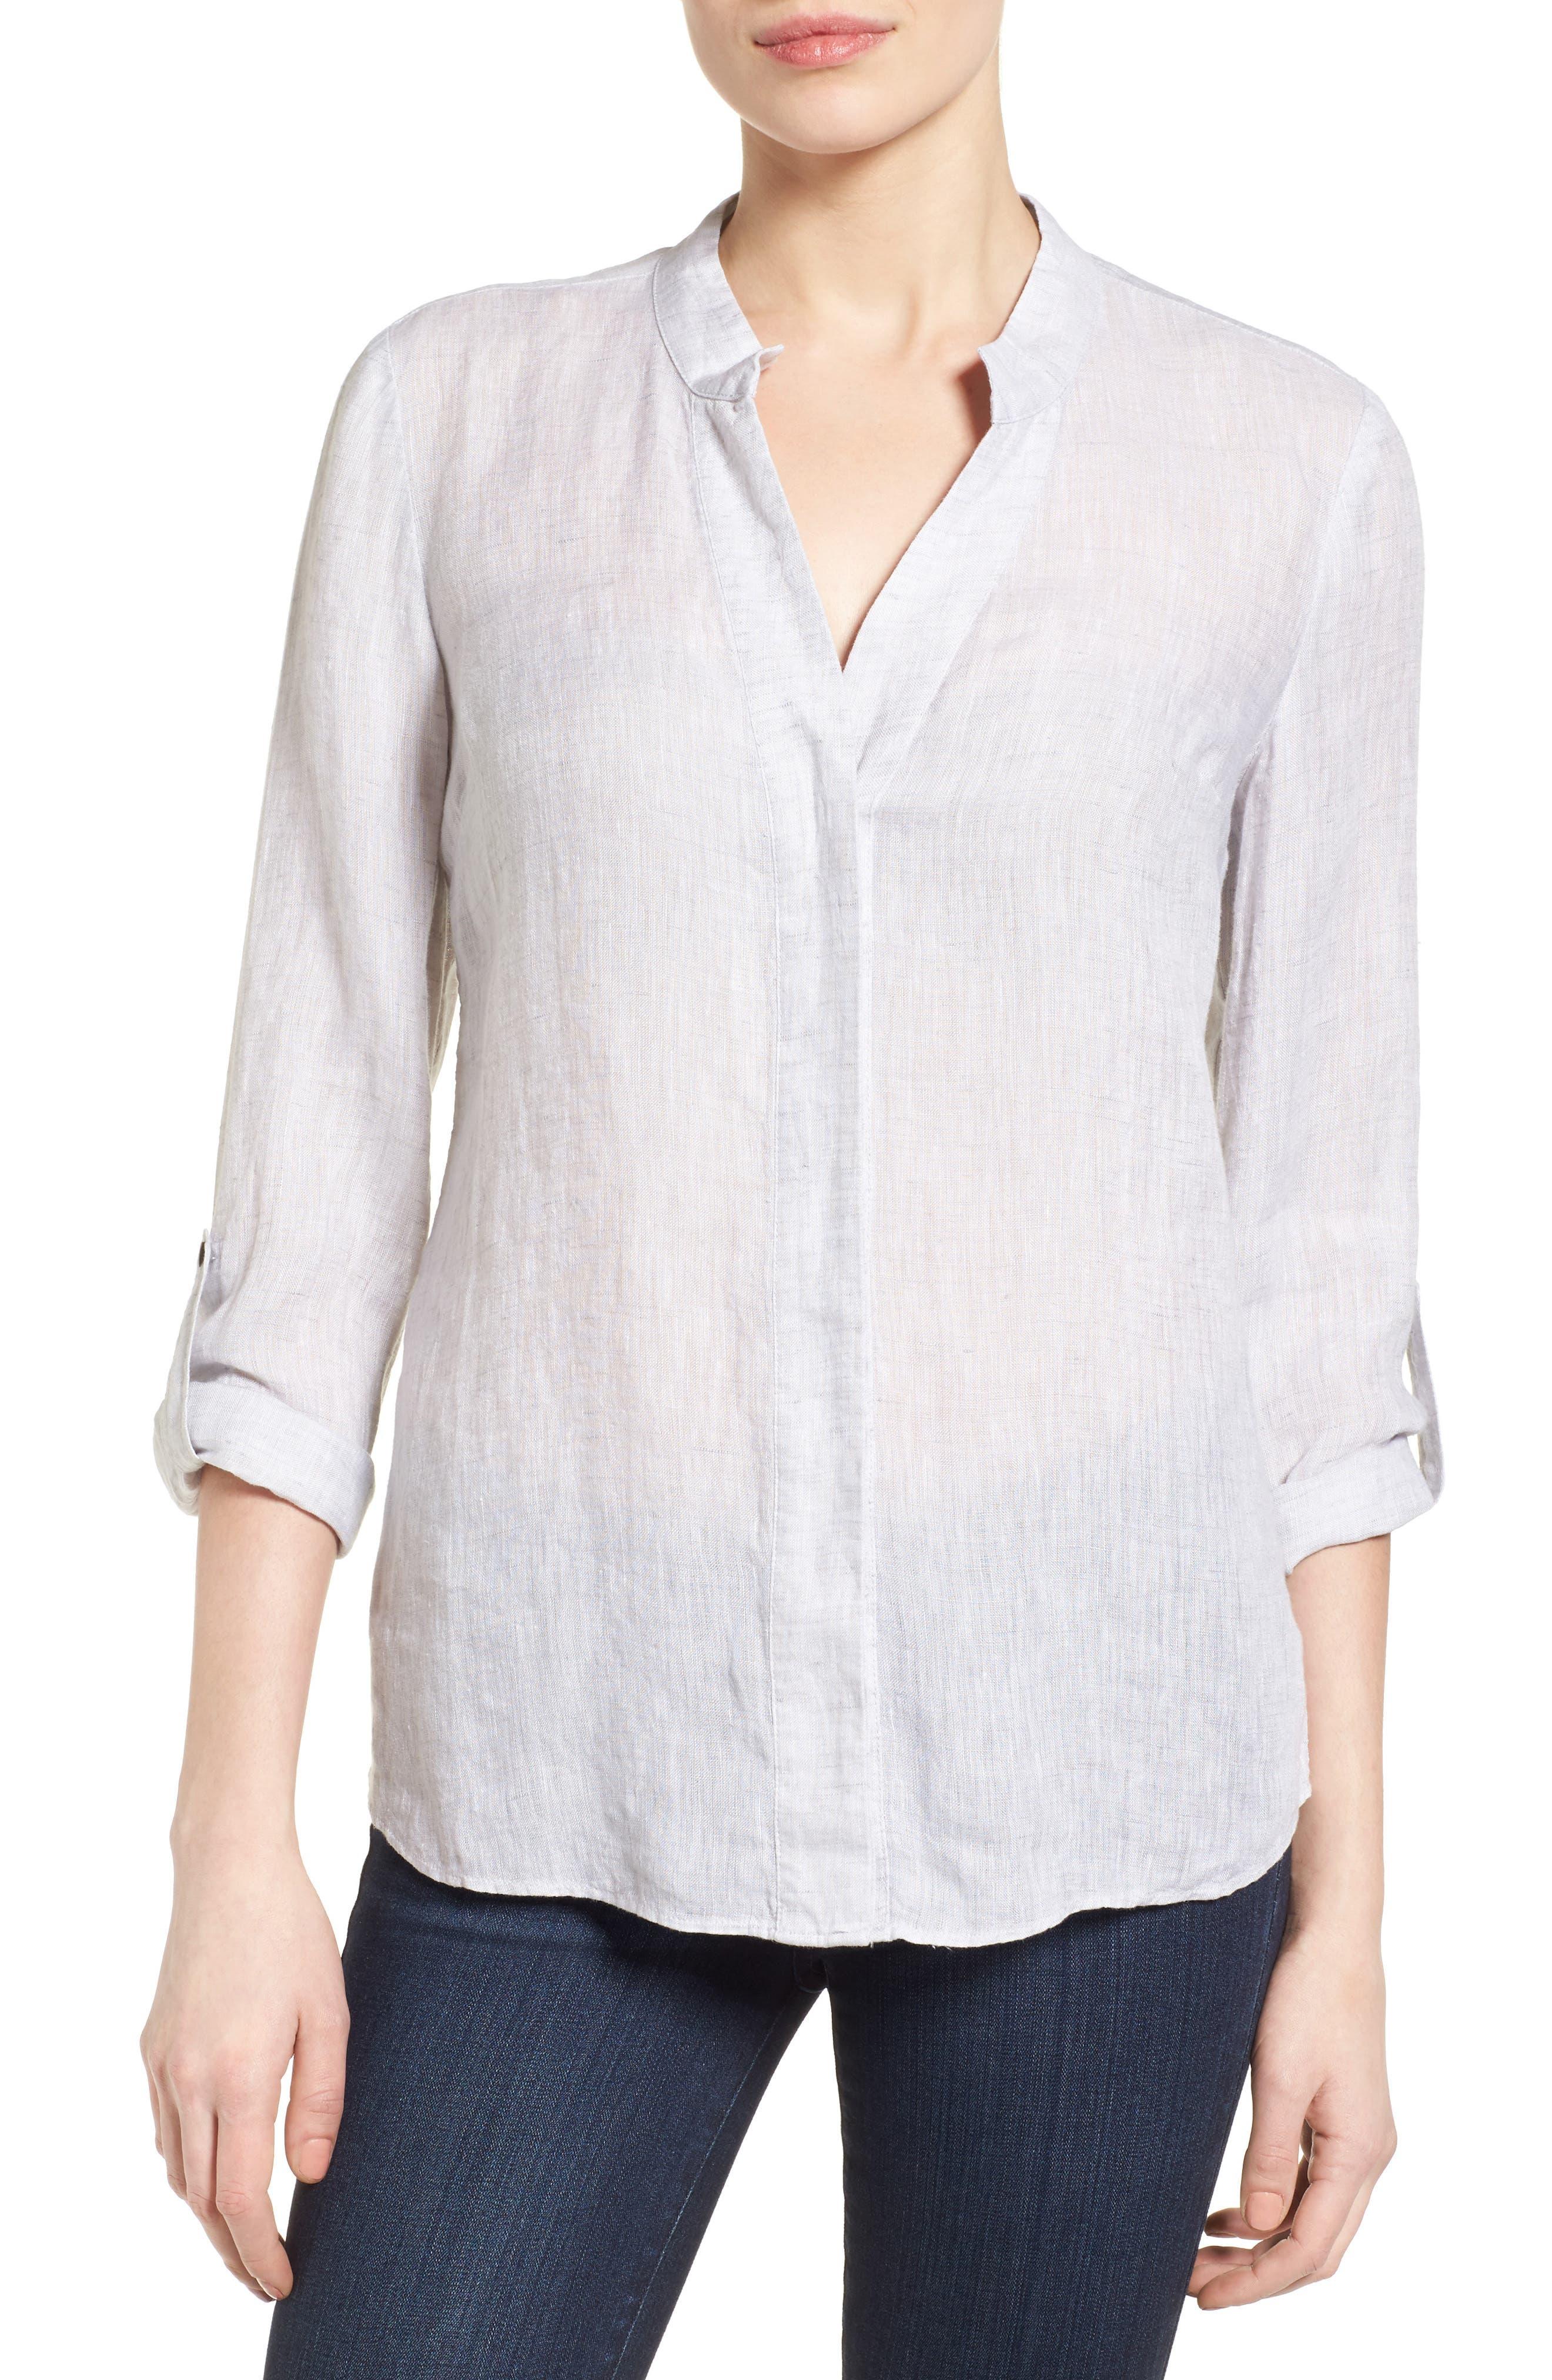 Drifty Linen Shirt,                             Main thumbnail 1, color,                             030